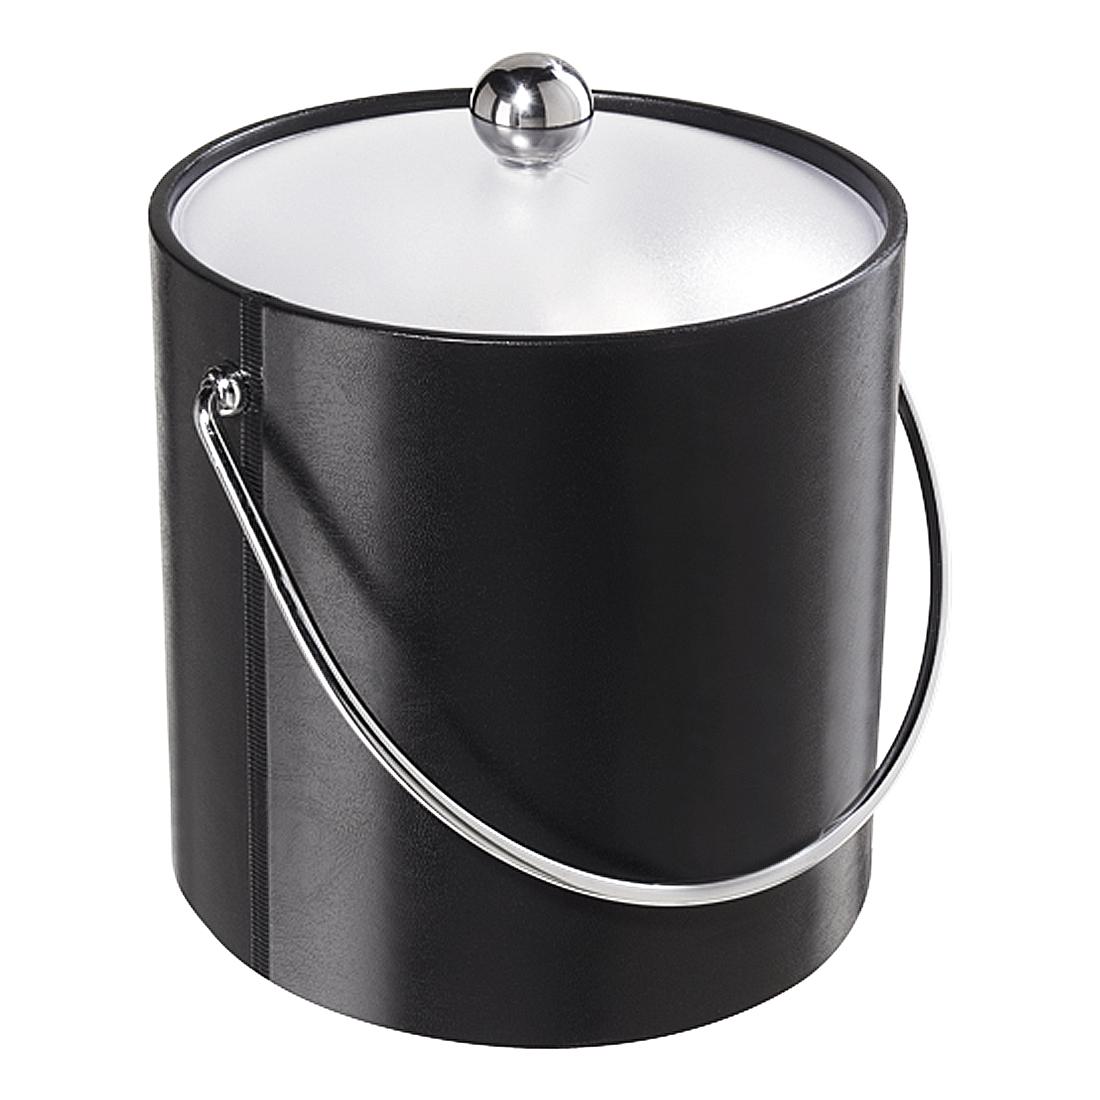 Oggi Black and White Vinyl 3 Quart Ice Bucket with Lid